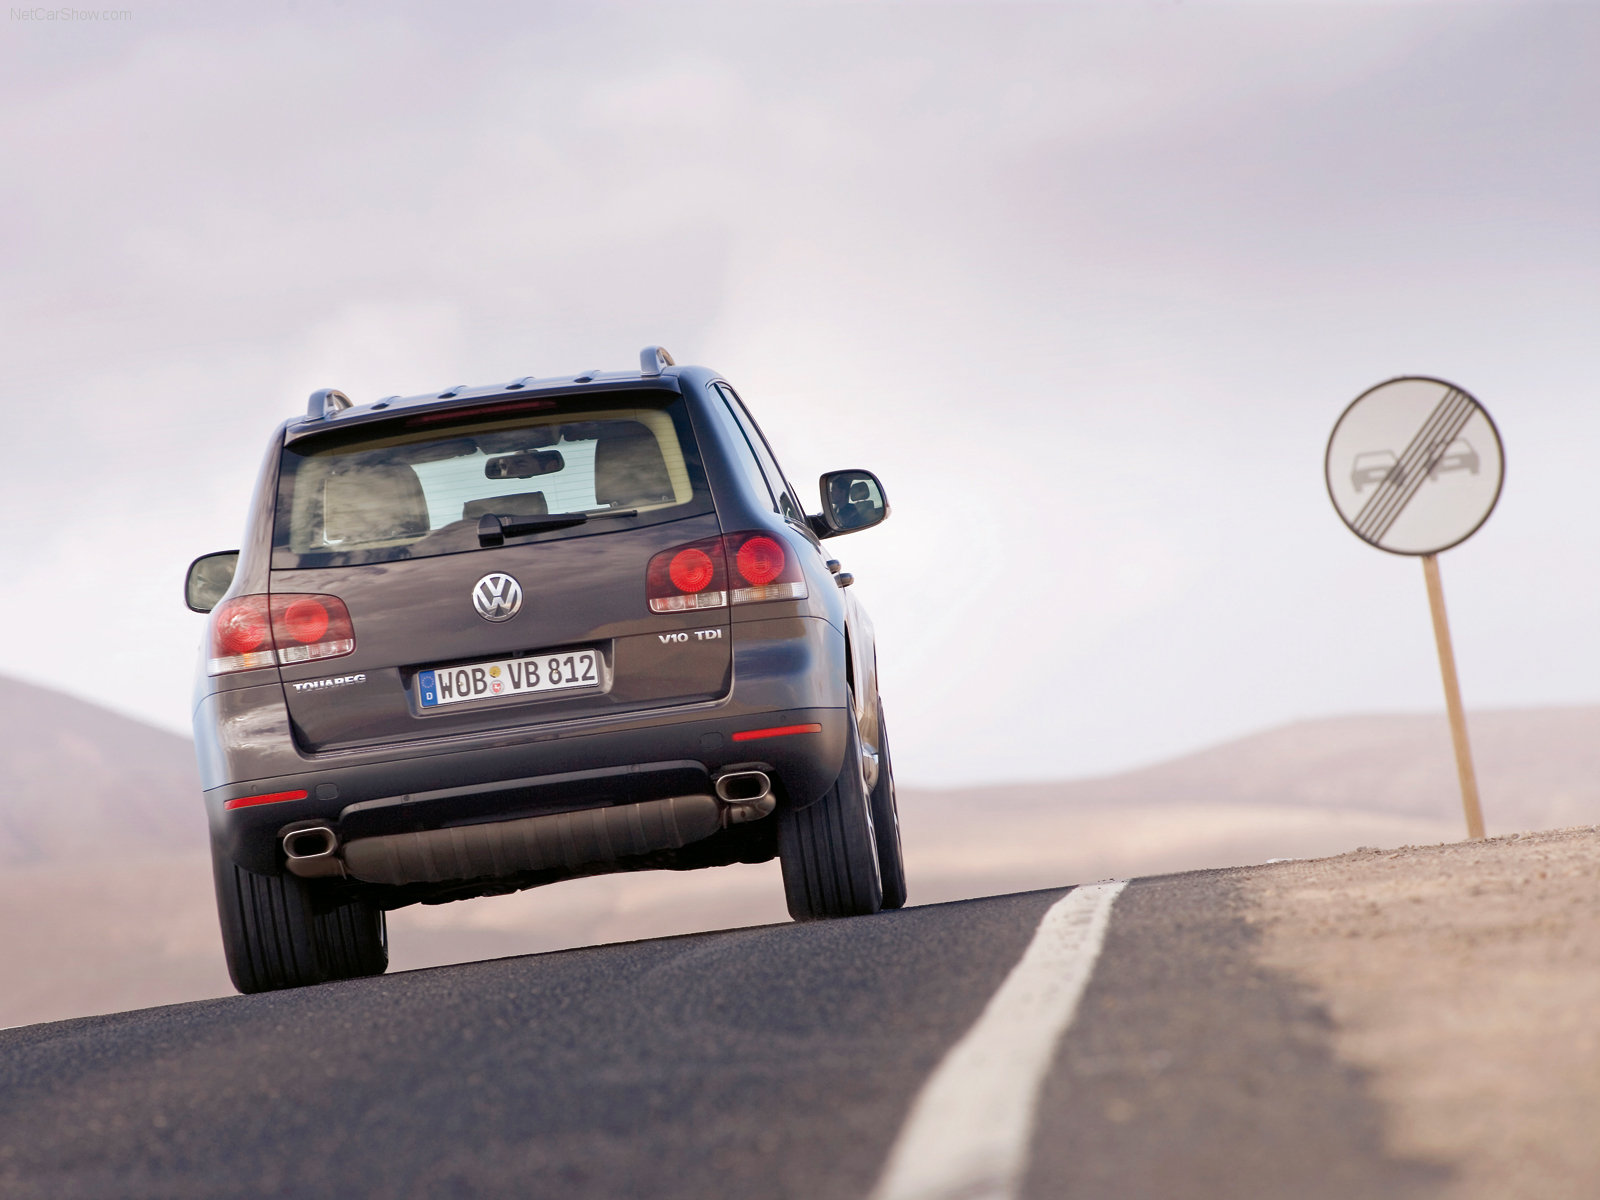 https://w04.ru/foto/Volkswagen-Touareg_2007_1600x1200_wallpaper_1d.jpg